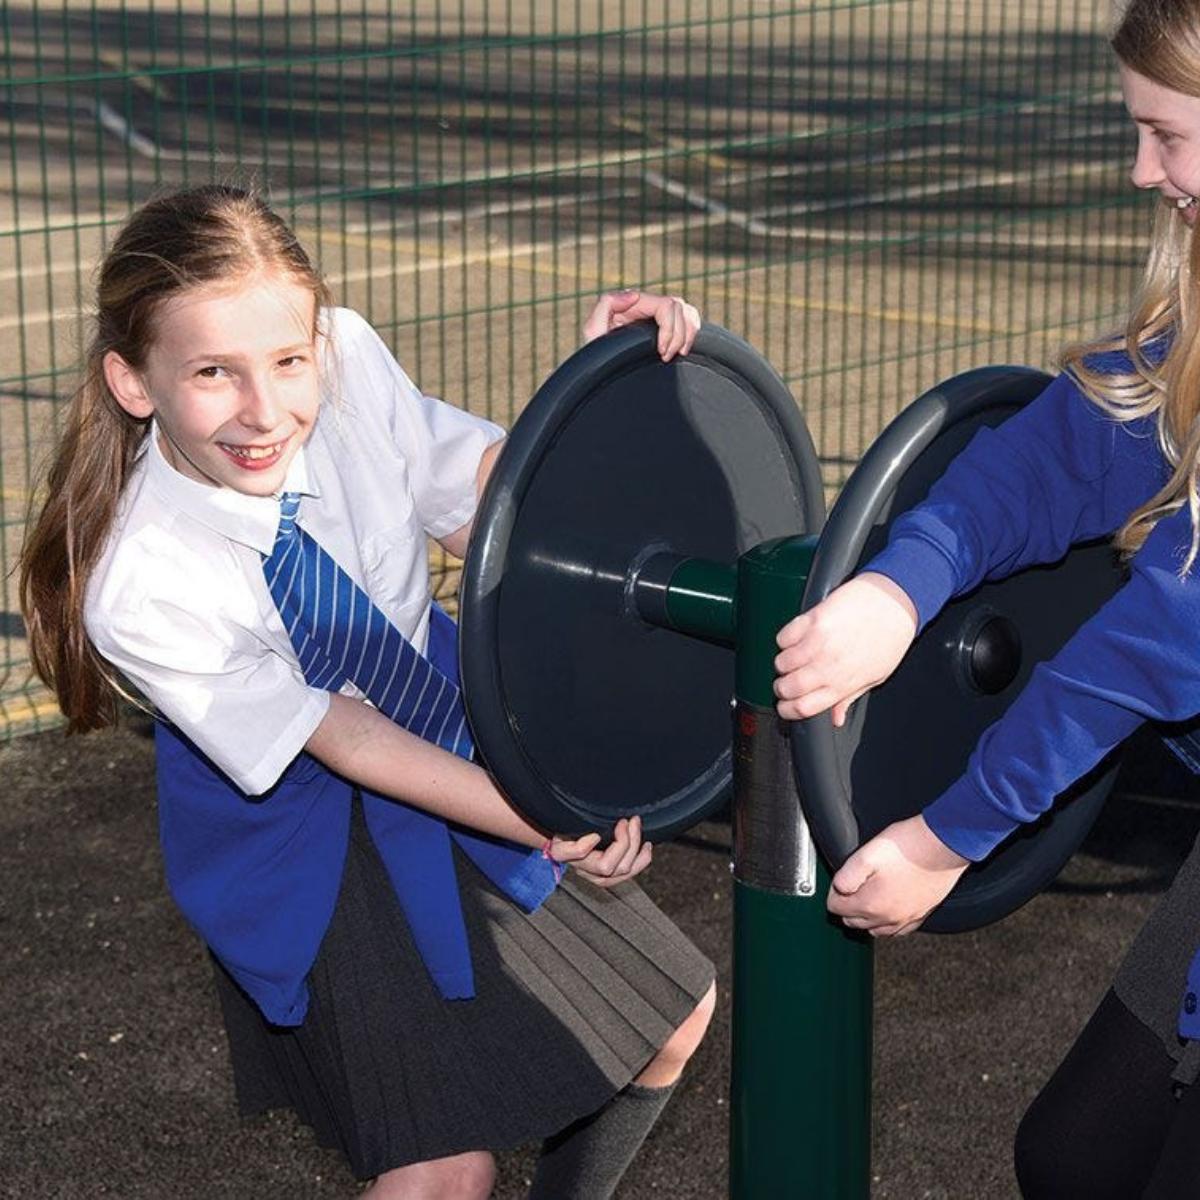 Children's Double Strength Challenger